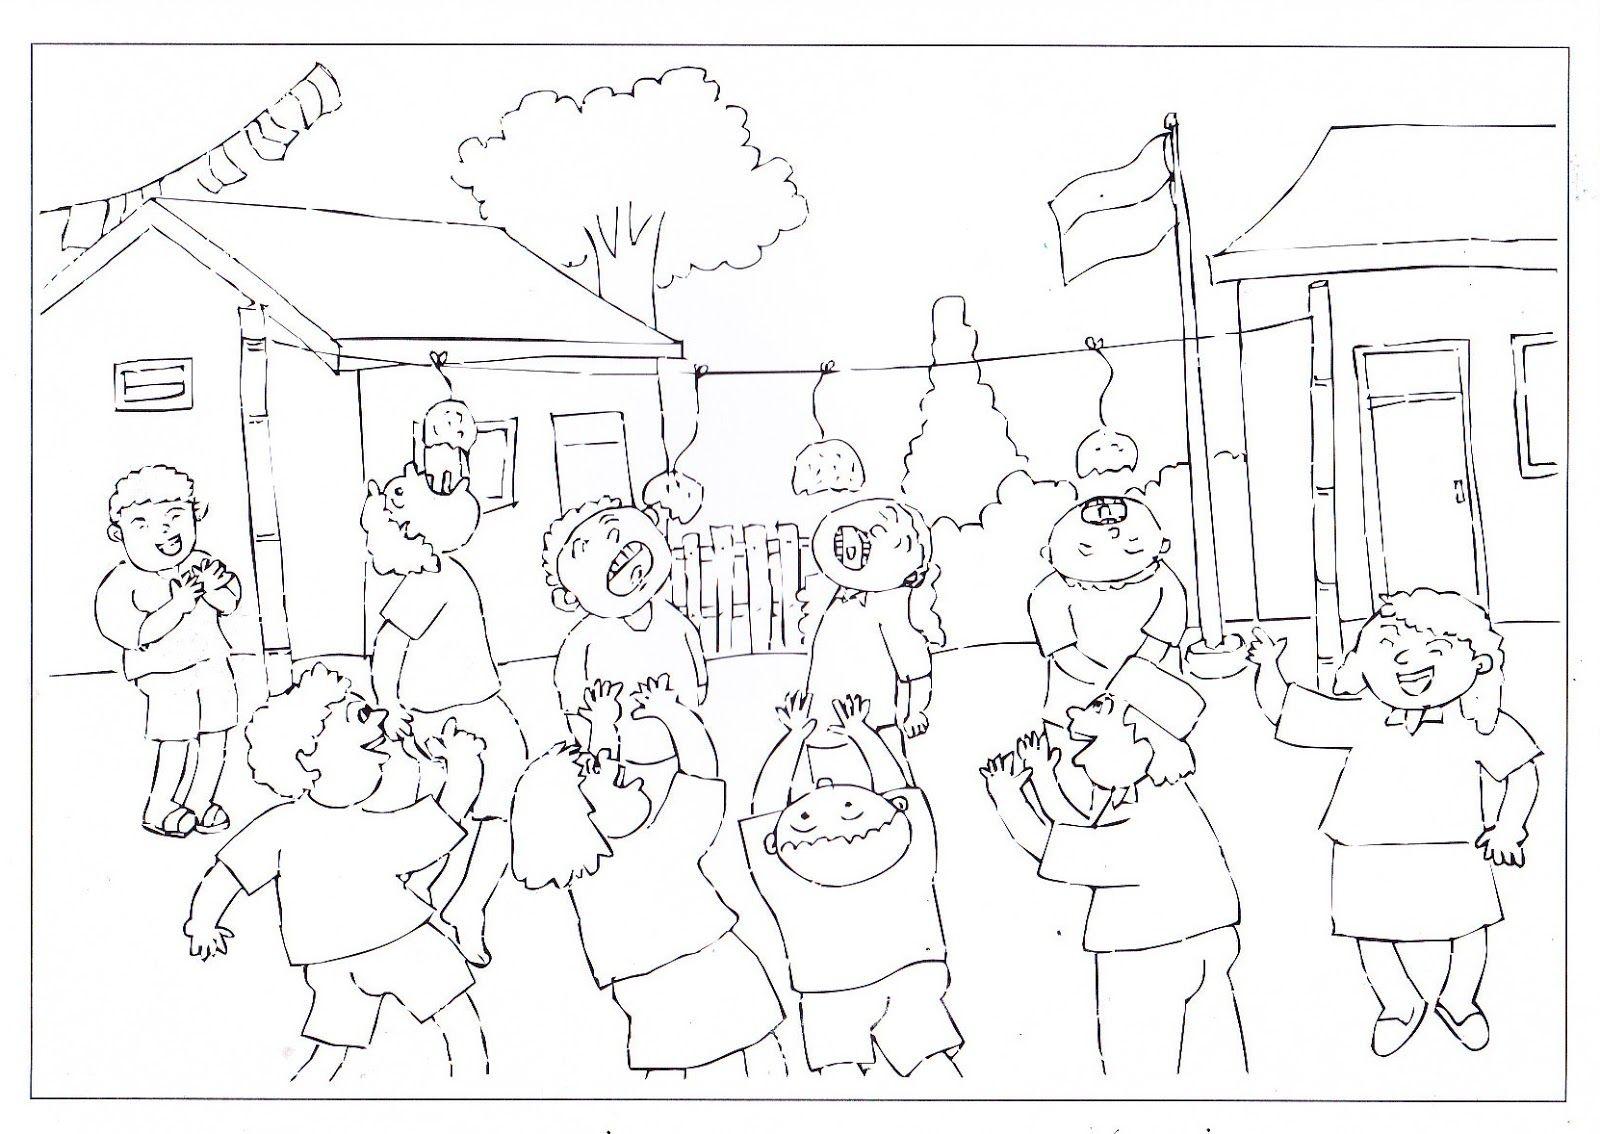 Sketch Projects Indonesia Coloring Preschool Frida Mewarnai Gambar Keramaian Pasar